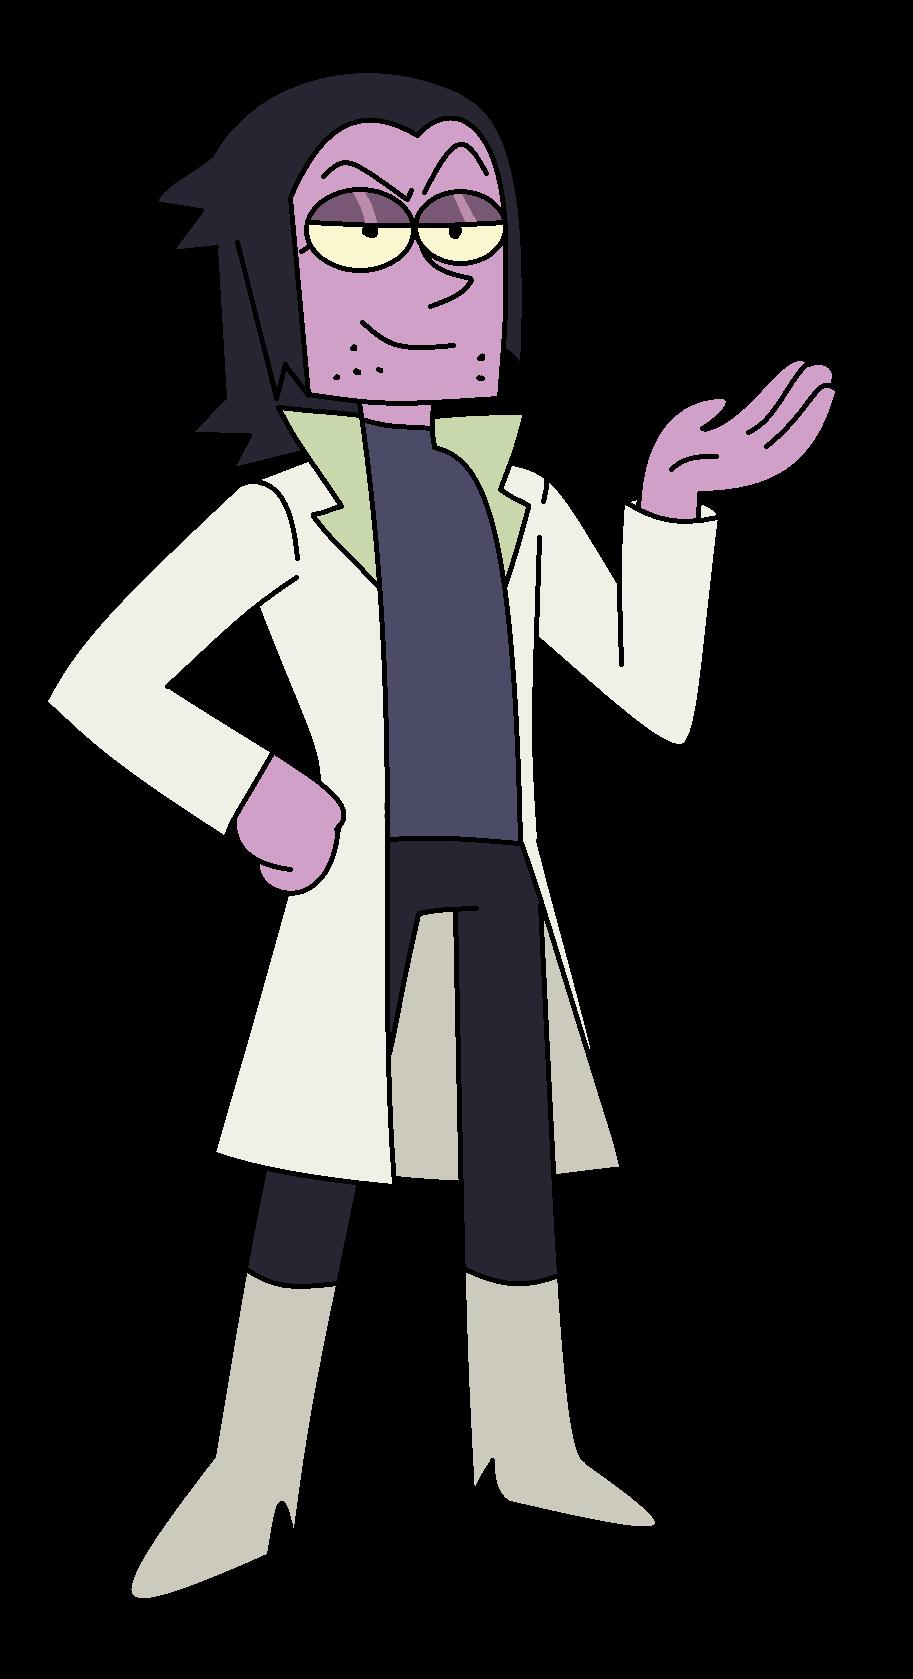 Koko Nigel/PE Removal Proposal: Professor Venomous